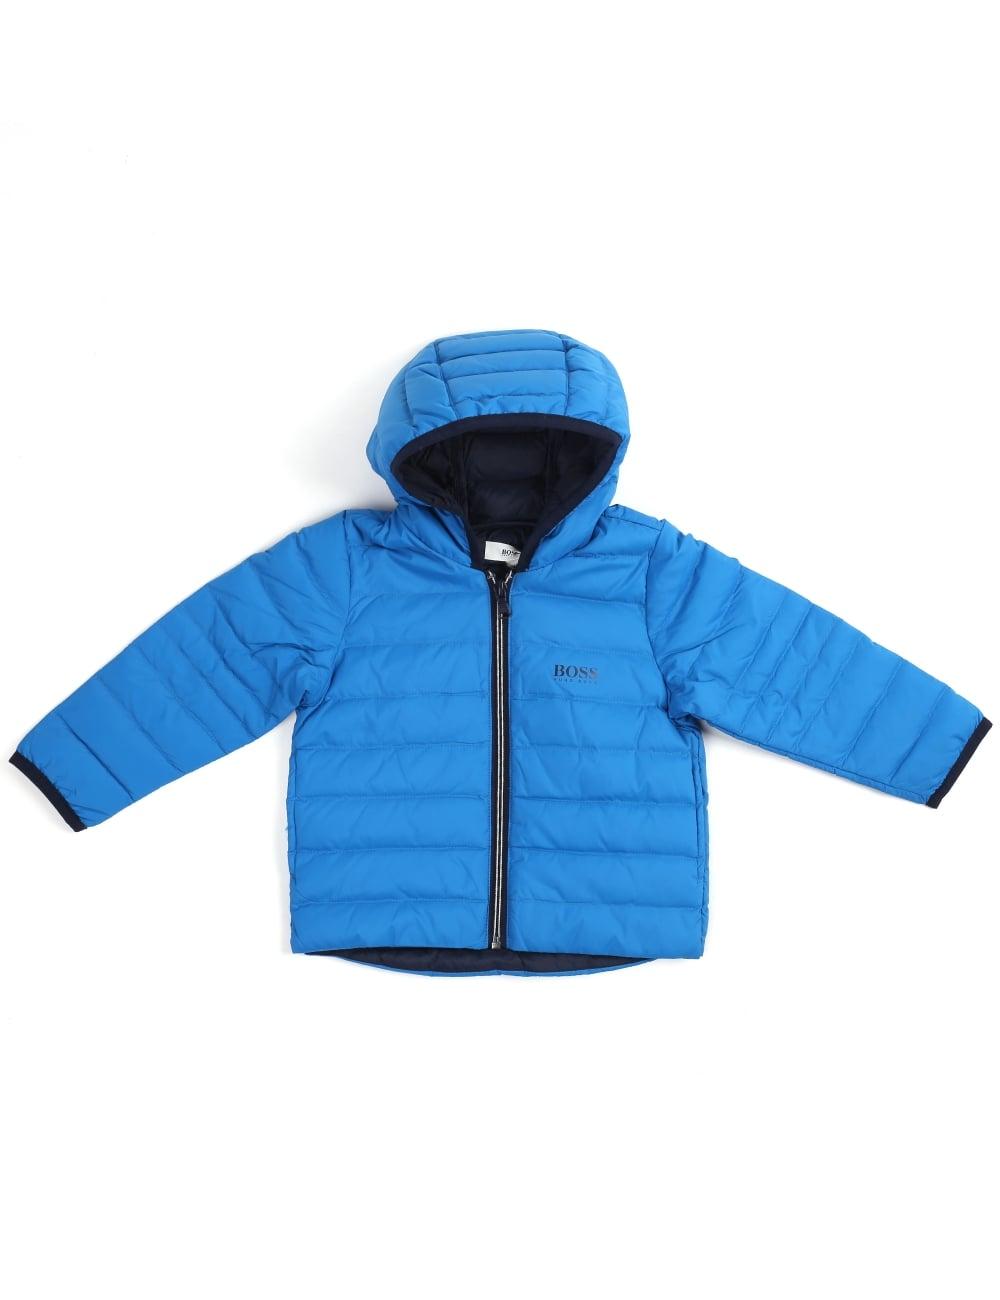 be600d176 Polo Ralph Lauren Baby Boy Zip Through Hooded Jacket Blue